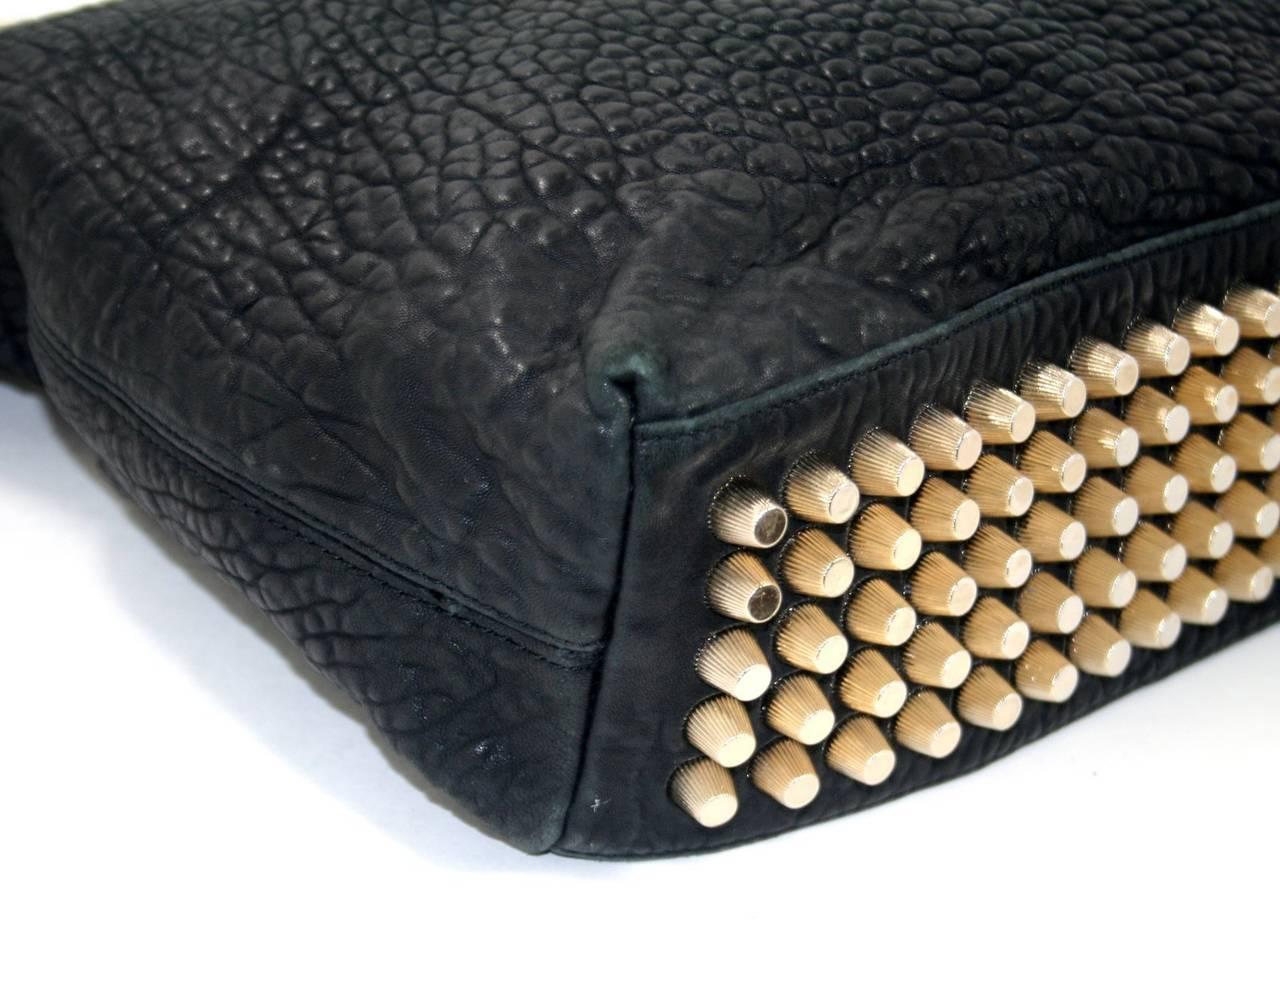 Alexander Wang Darcy Stud Bottom Hobo in Black Pebbled Leather 5